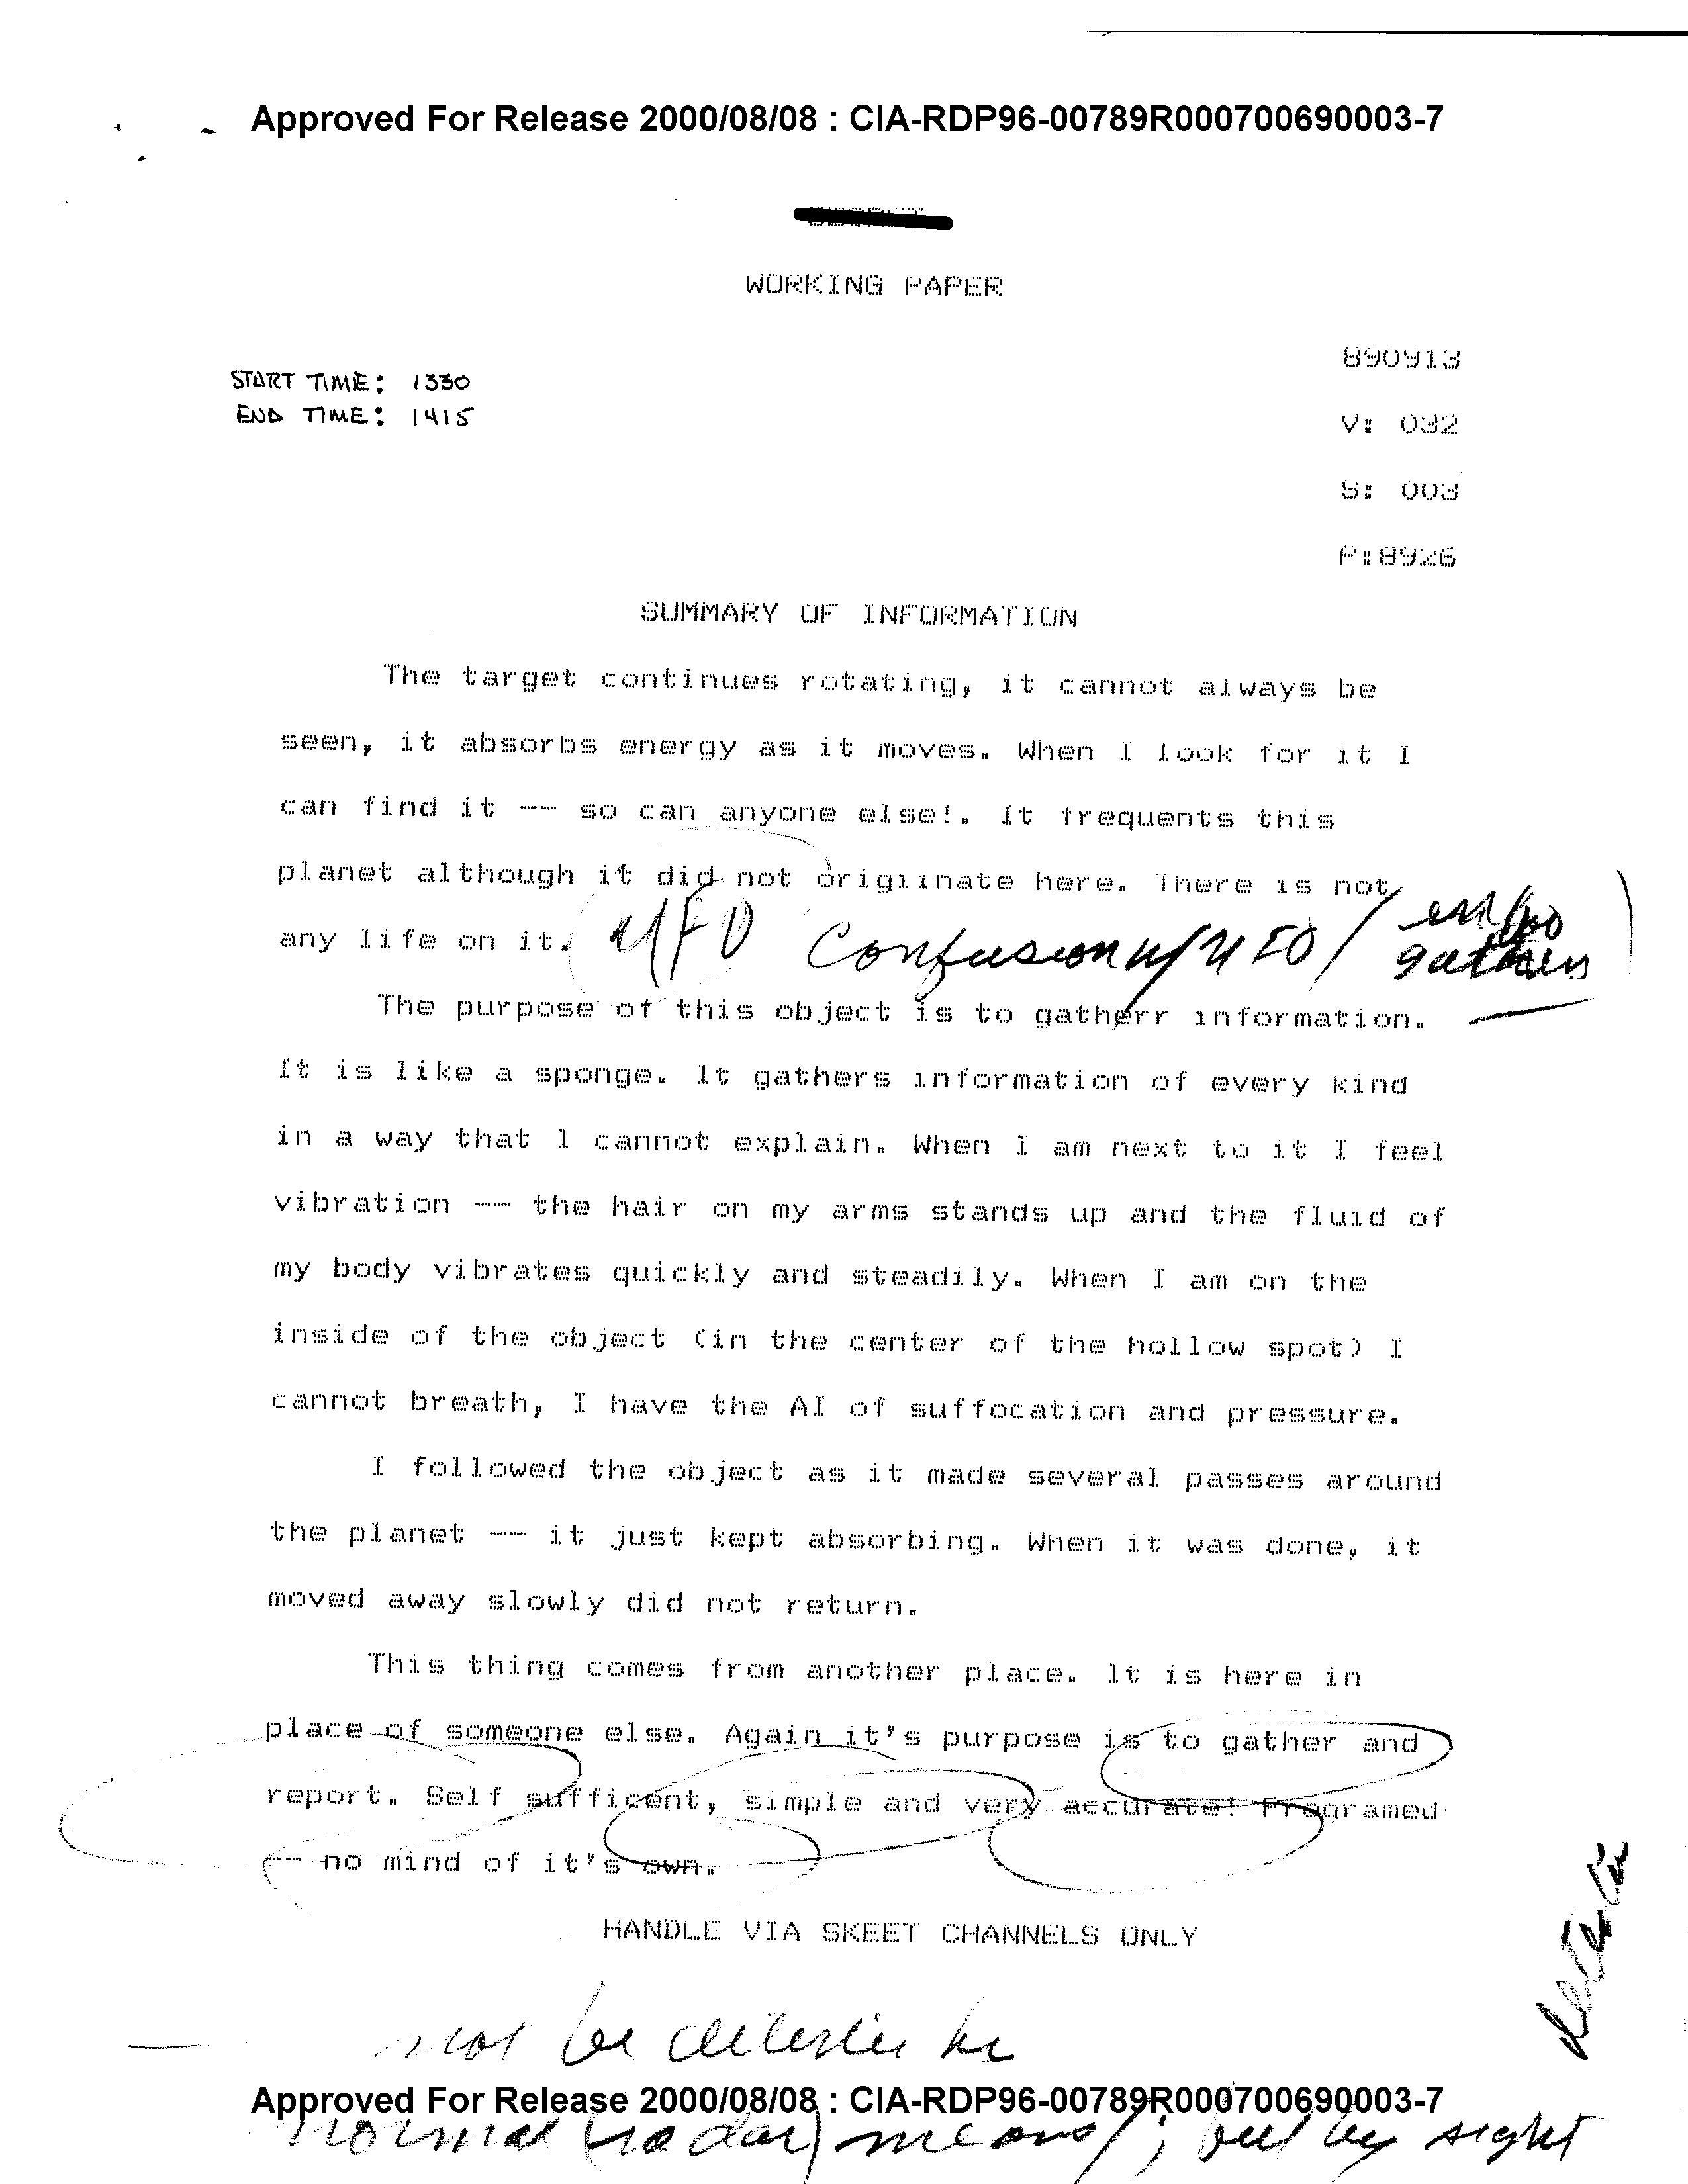 UFO-page-002 (1)